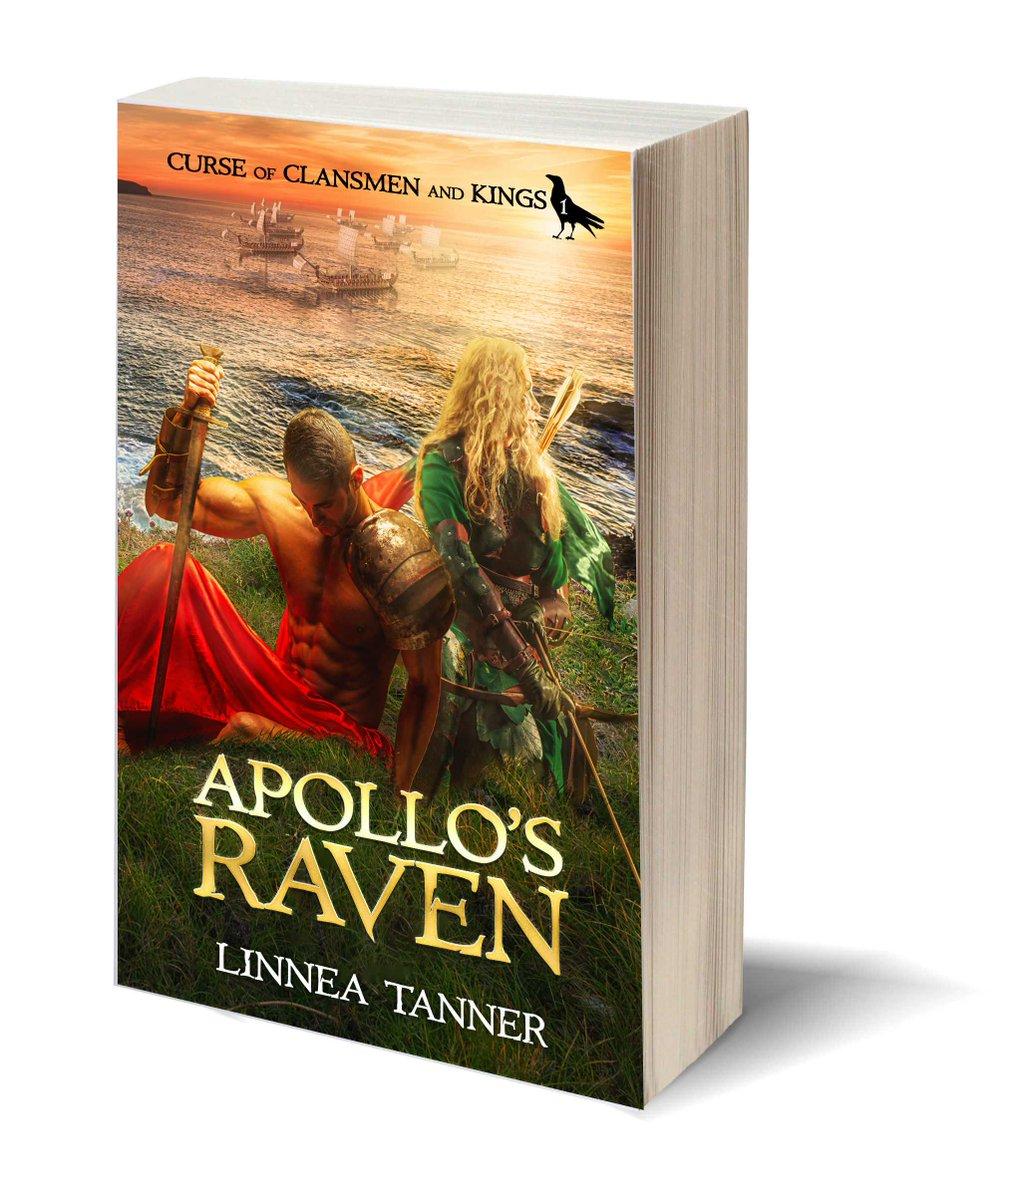 ★APOLLO'S RAVEN★  ✔http://getbook.at/ApollosRaven   http://wp.me/P5rIsN-3ll linneatanner #BookBoost ASMSG  ✎via Pizzazz Book Promotions http://wp.me/P5rIsN-Ft #IAN1